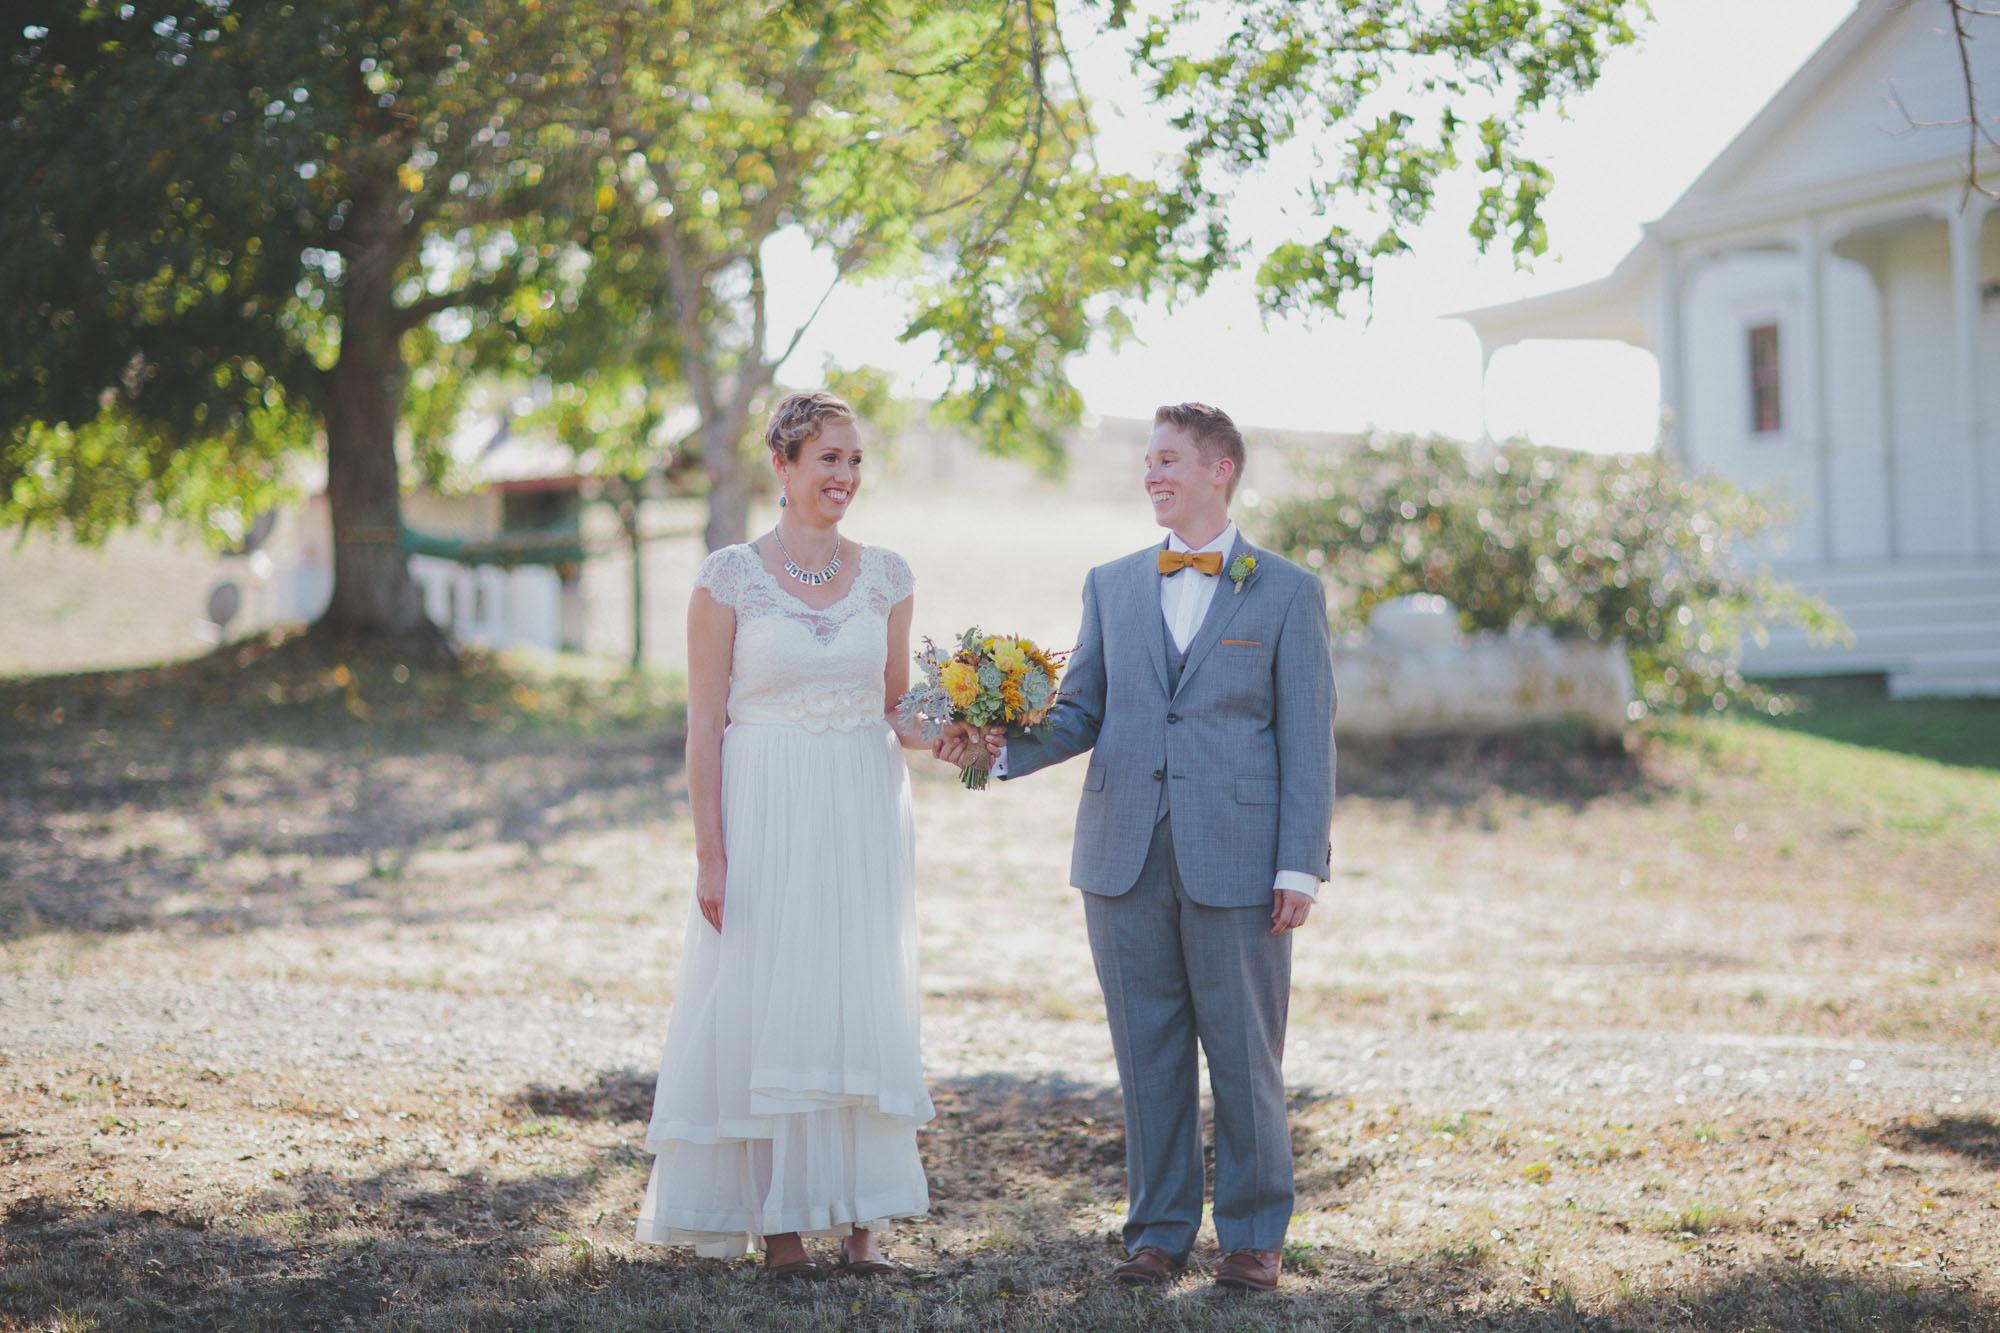 Gretchen_Gause_Petaluma_Olympias_Valley_Wedding_Photo-096.jpg